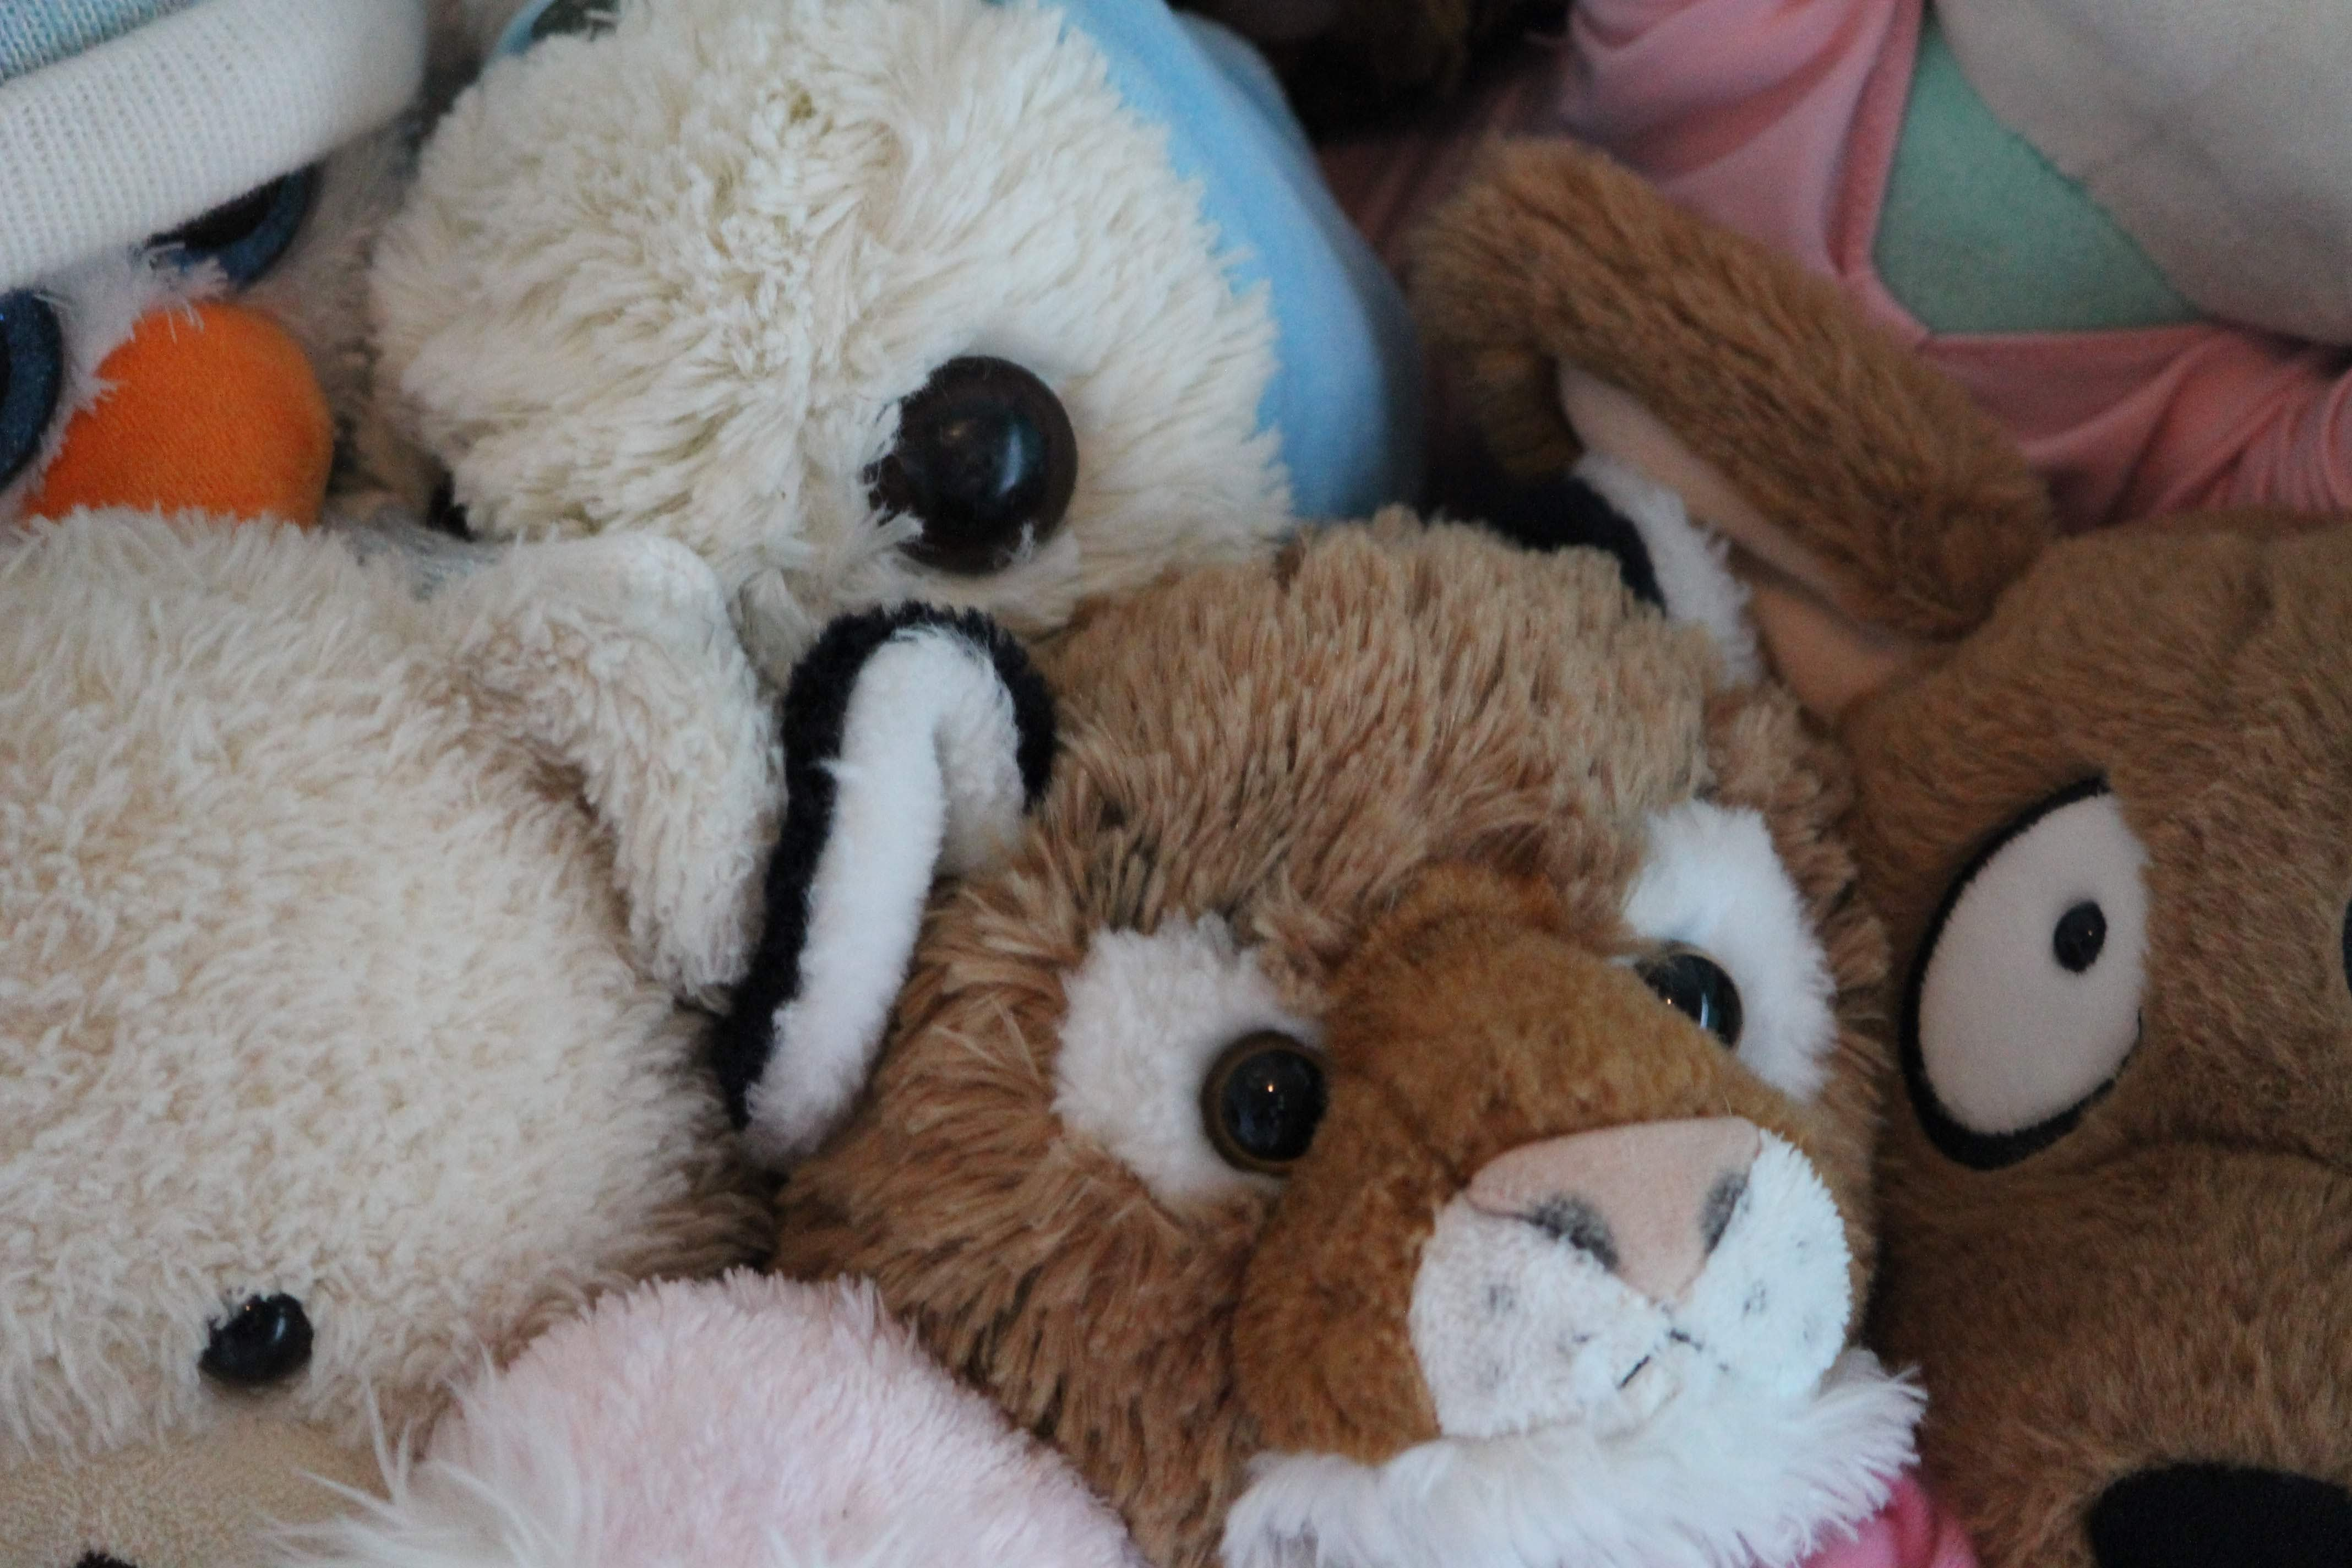 Kids DIY Stuffed Animals (Ages 0-8)